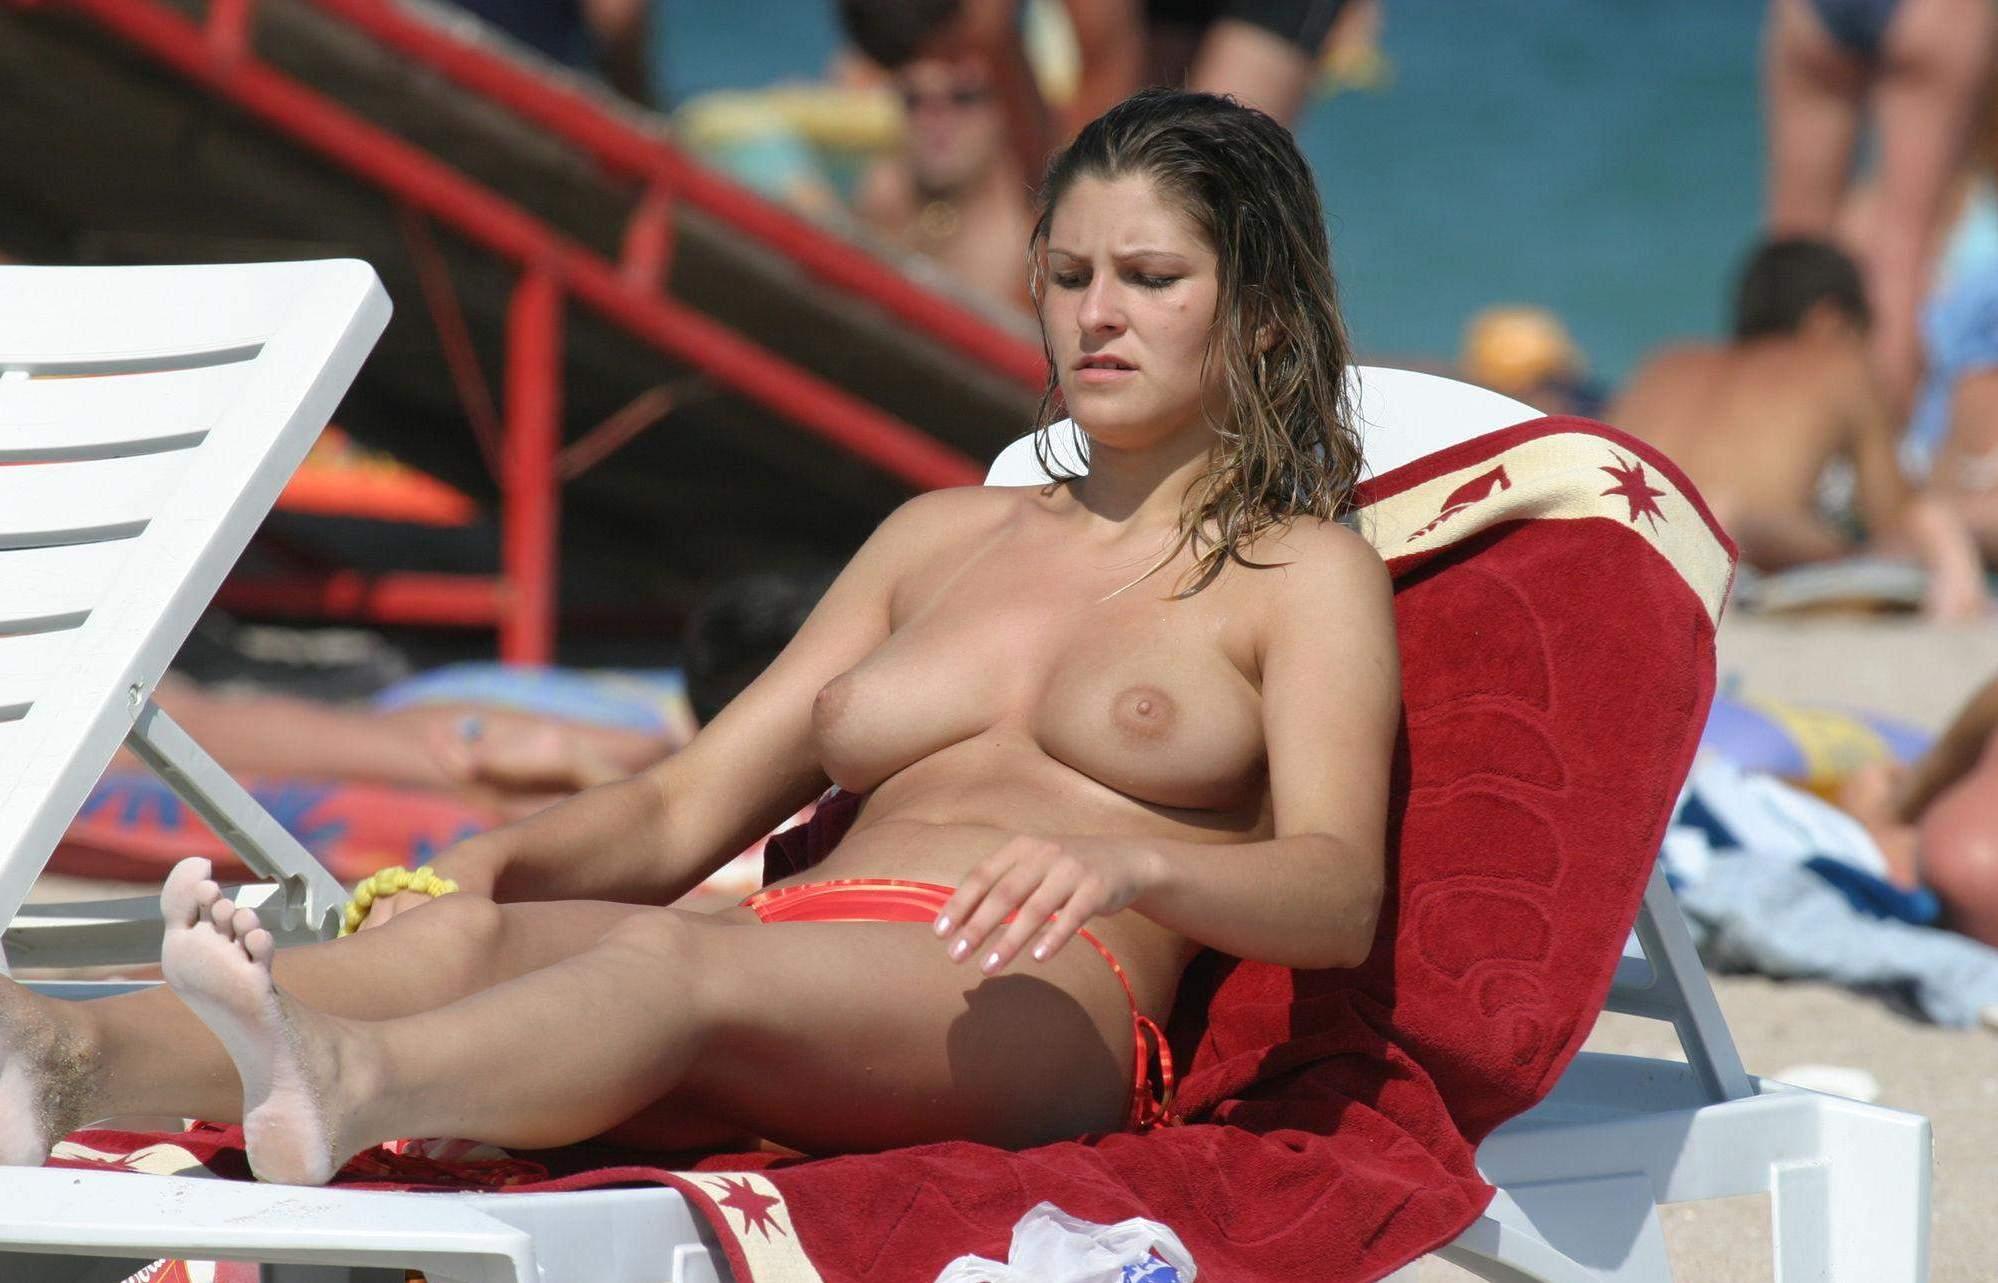 Topless girl enjoying the sunny beach